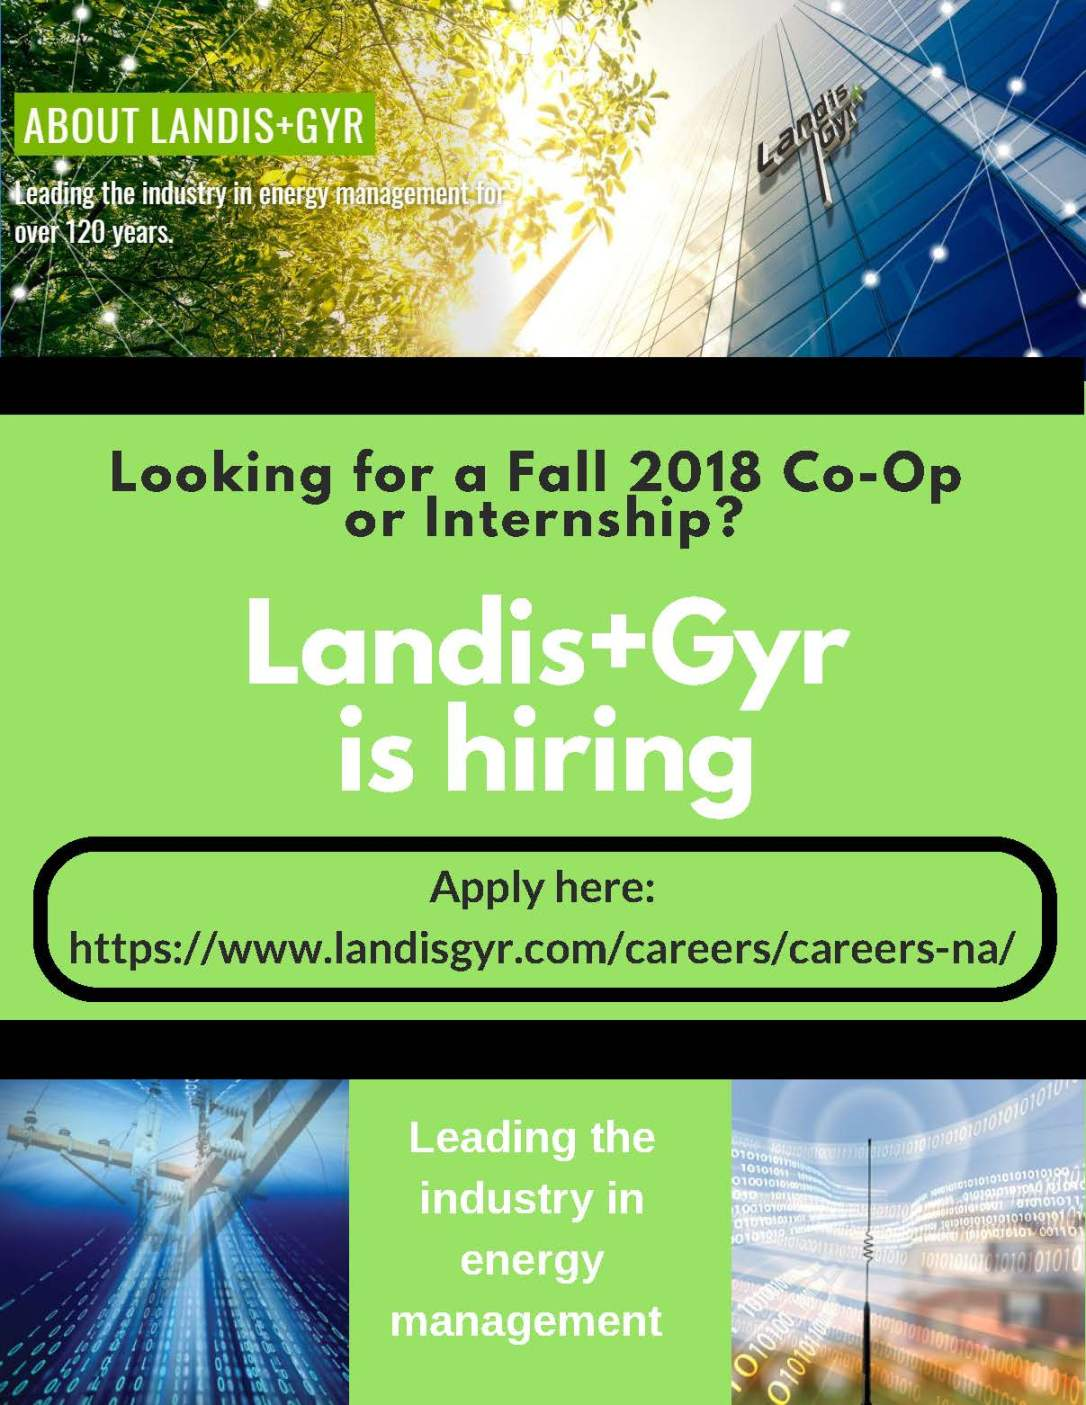 Landis+Gyr Co-op Intern